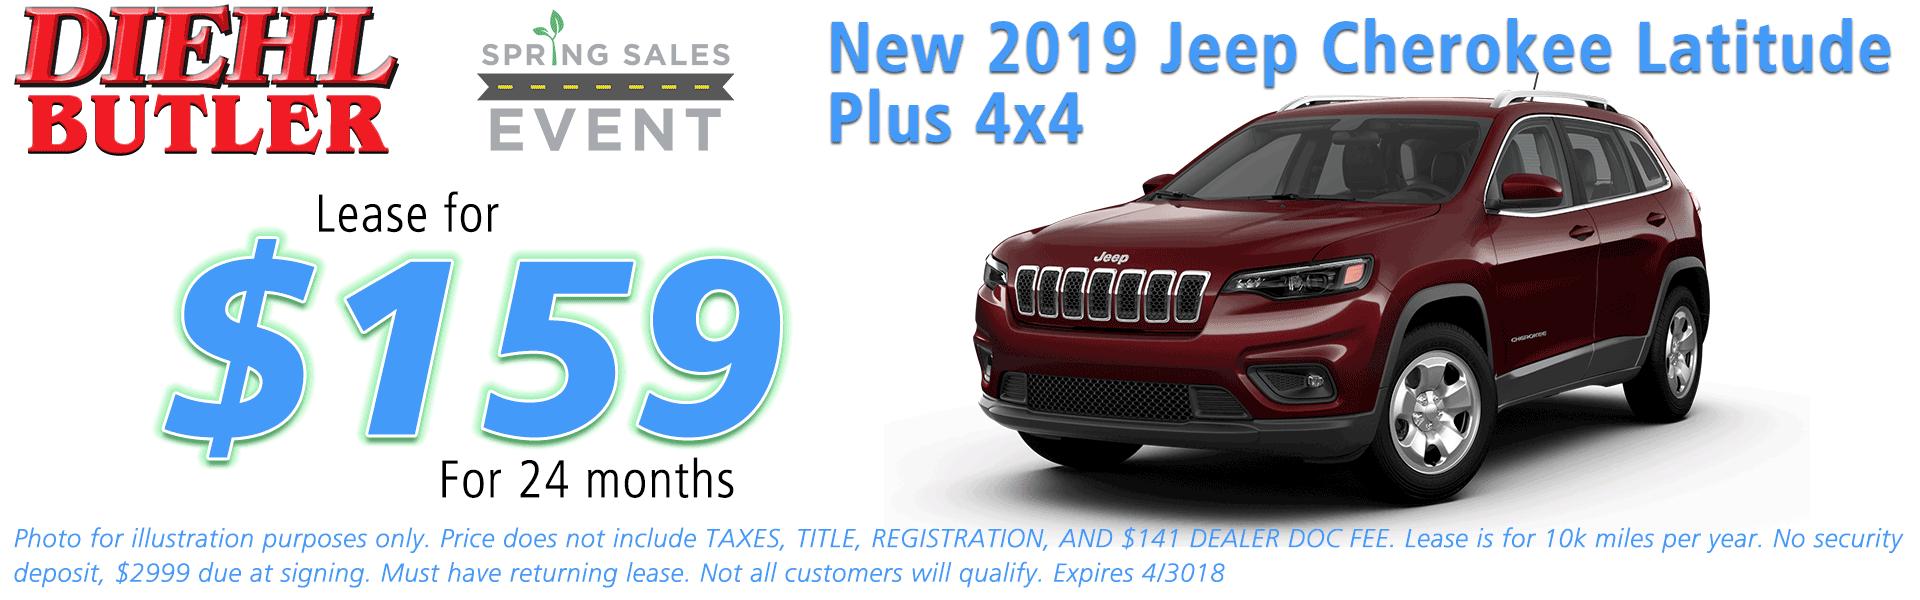 NEW 2019 JEEP CHEROKEE LATITUDE PLUS 4X4 Diehl of Butler Chrysler Jeep Dodge Ram Toyota Volkswagen 258 Pittsburgh Road Butler PA 16002